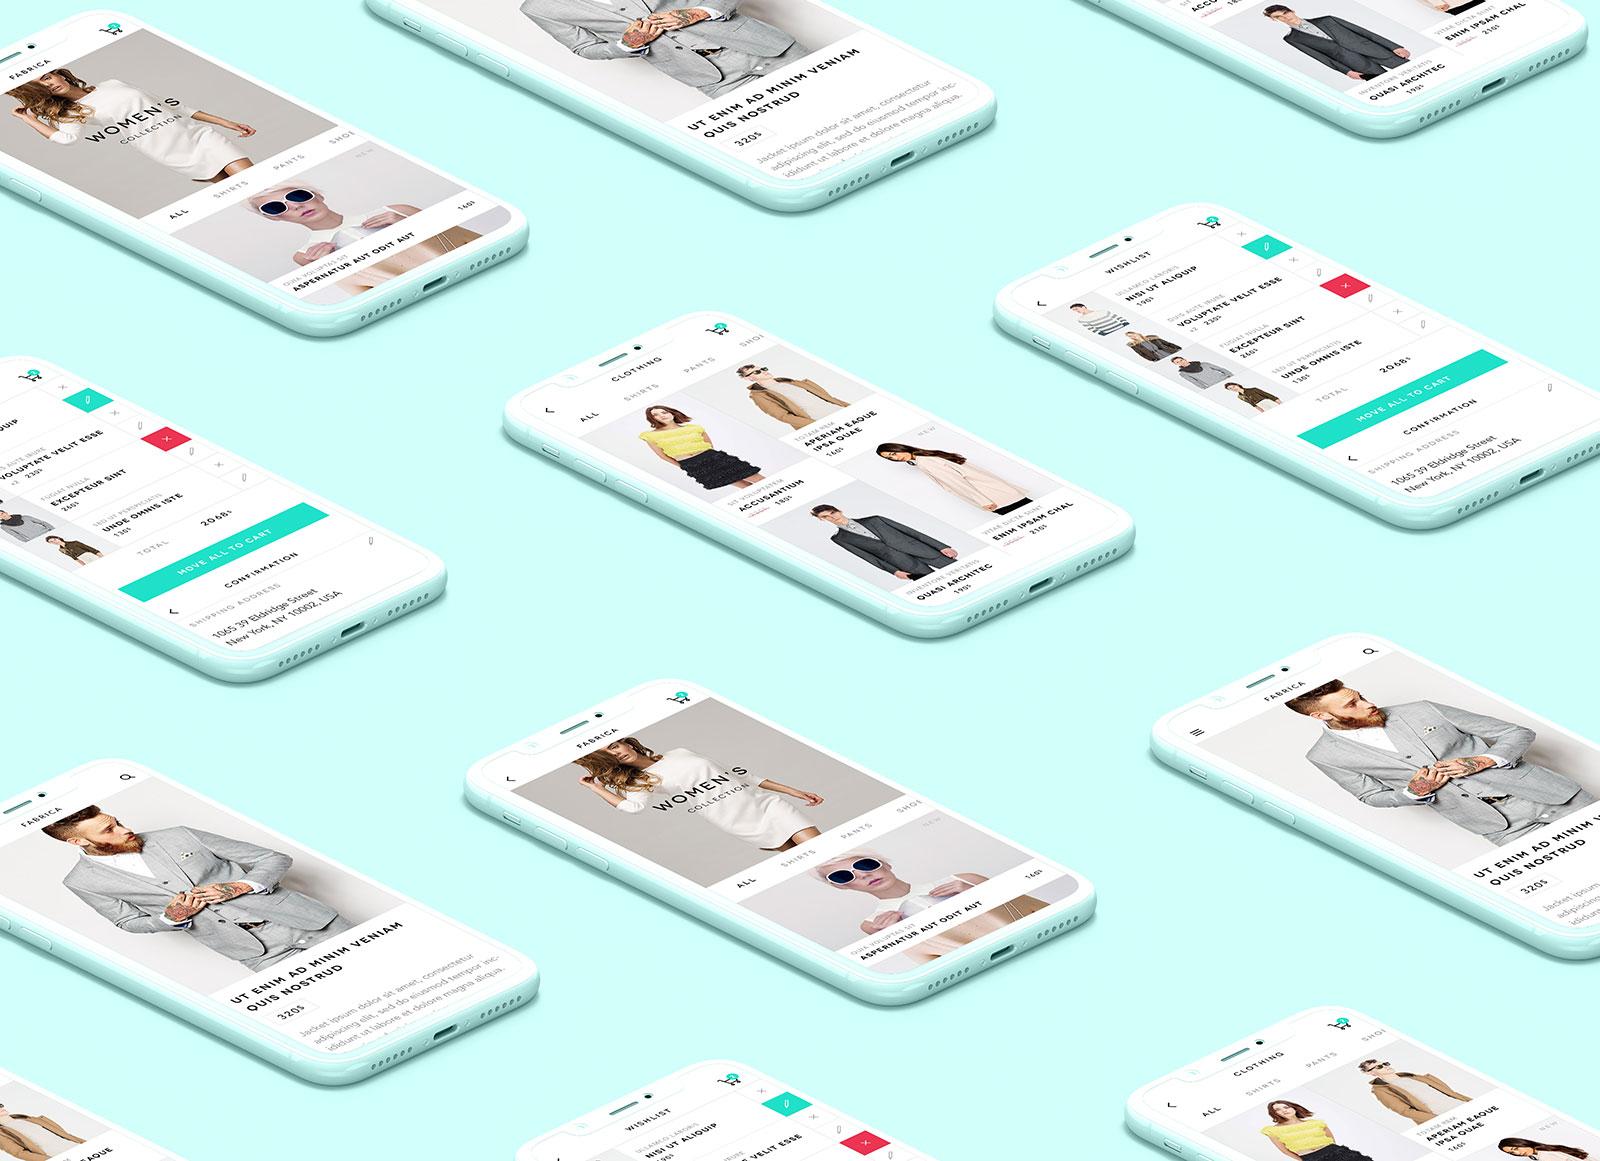 Free-iPhone-X-Isometric-Monochrome-UI-Presentation-App-Mockup-PSD-2